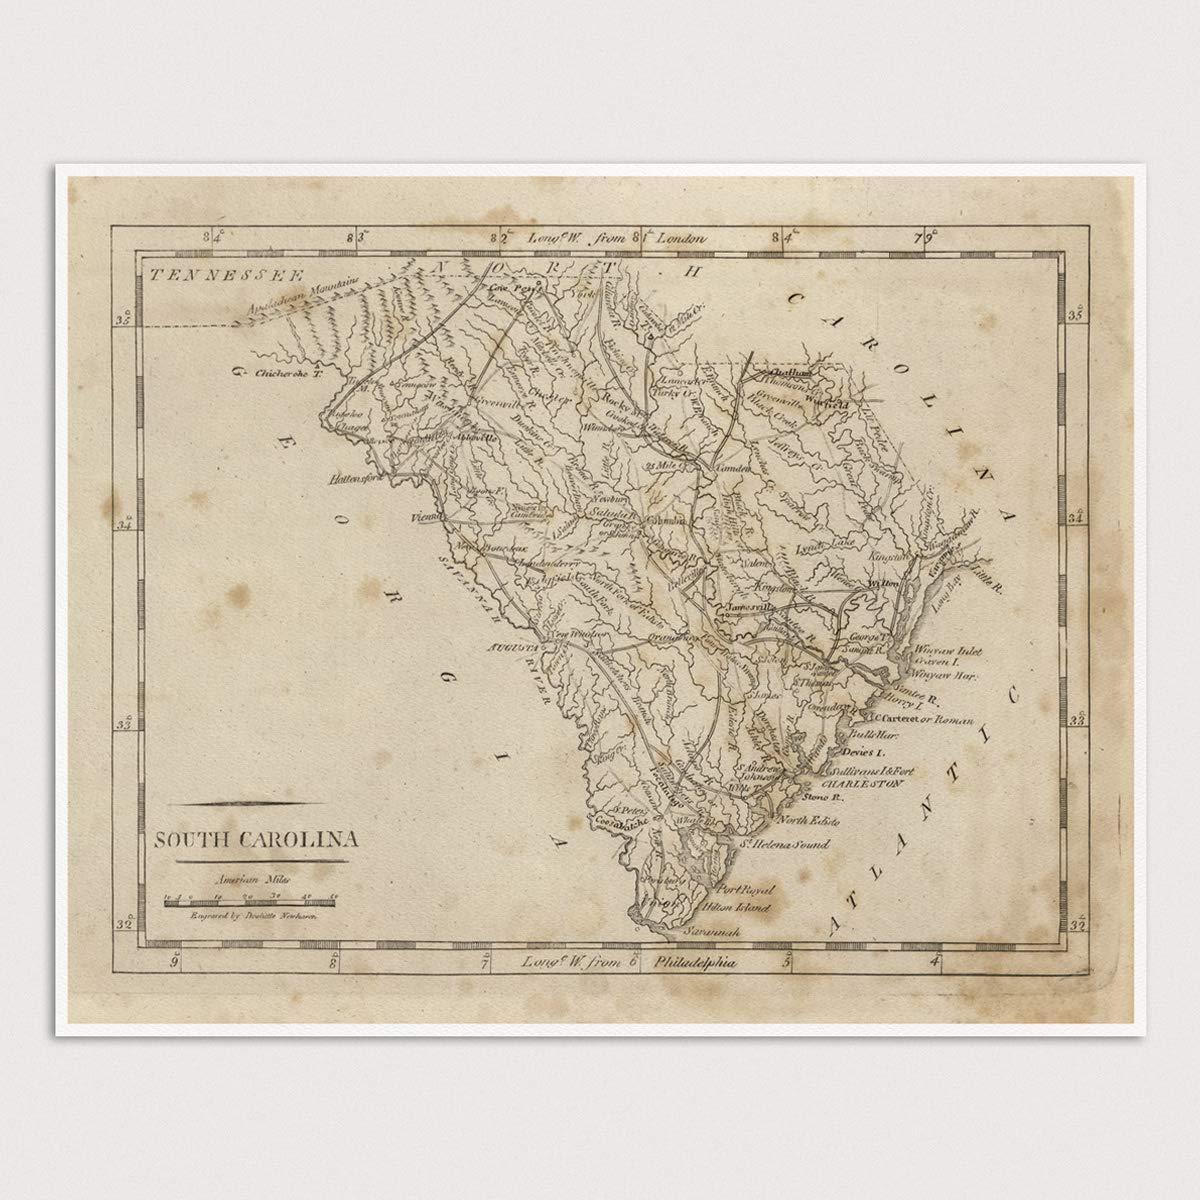 image regarding Printable Maps of South Carolina titled : Outdated South Carolina Map Artwork Print, 1816, Archival